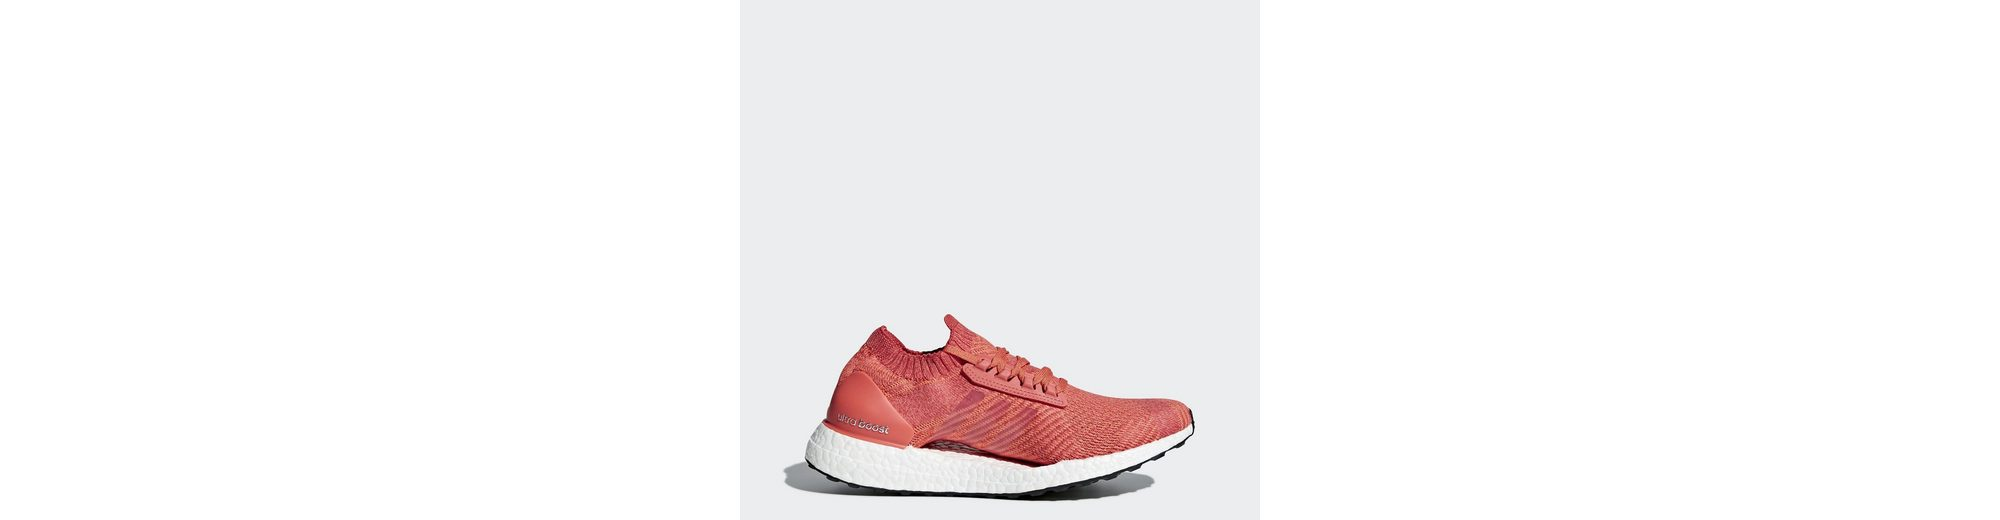 Adidas Schuh Ultraboost X Laufschuh Performance frBqxHwfg